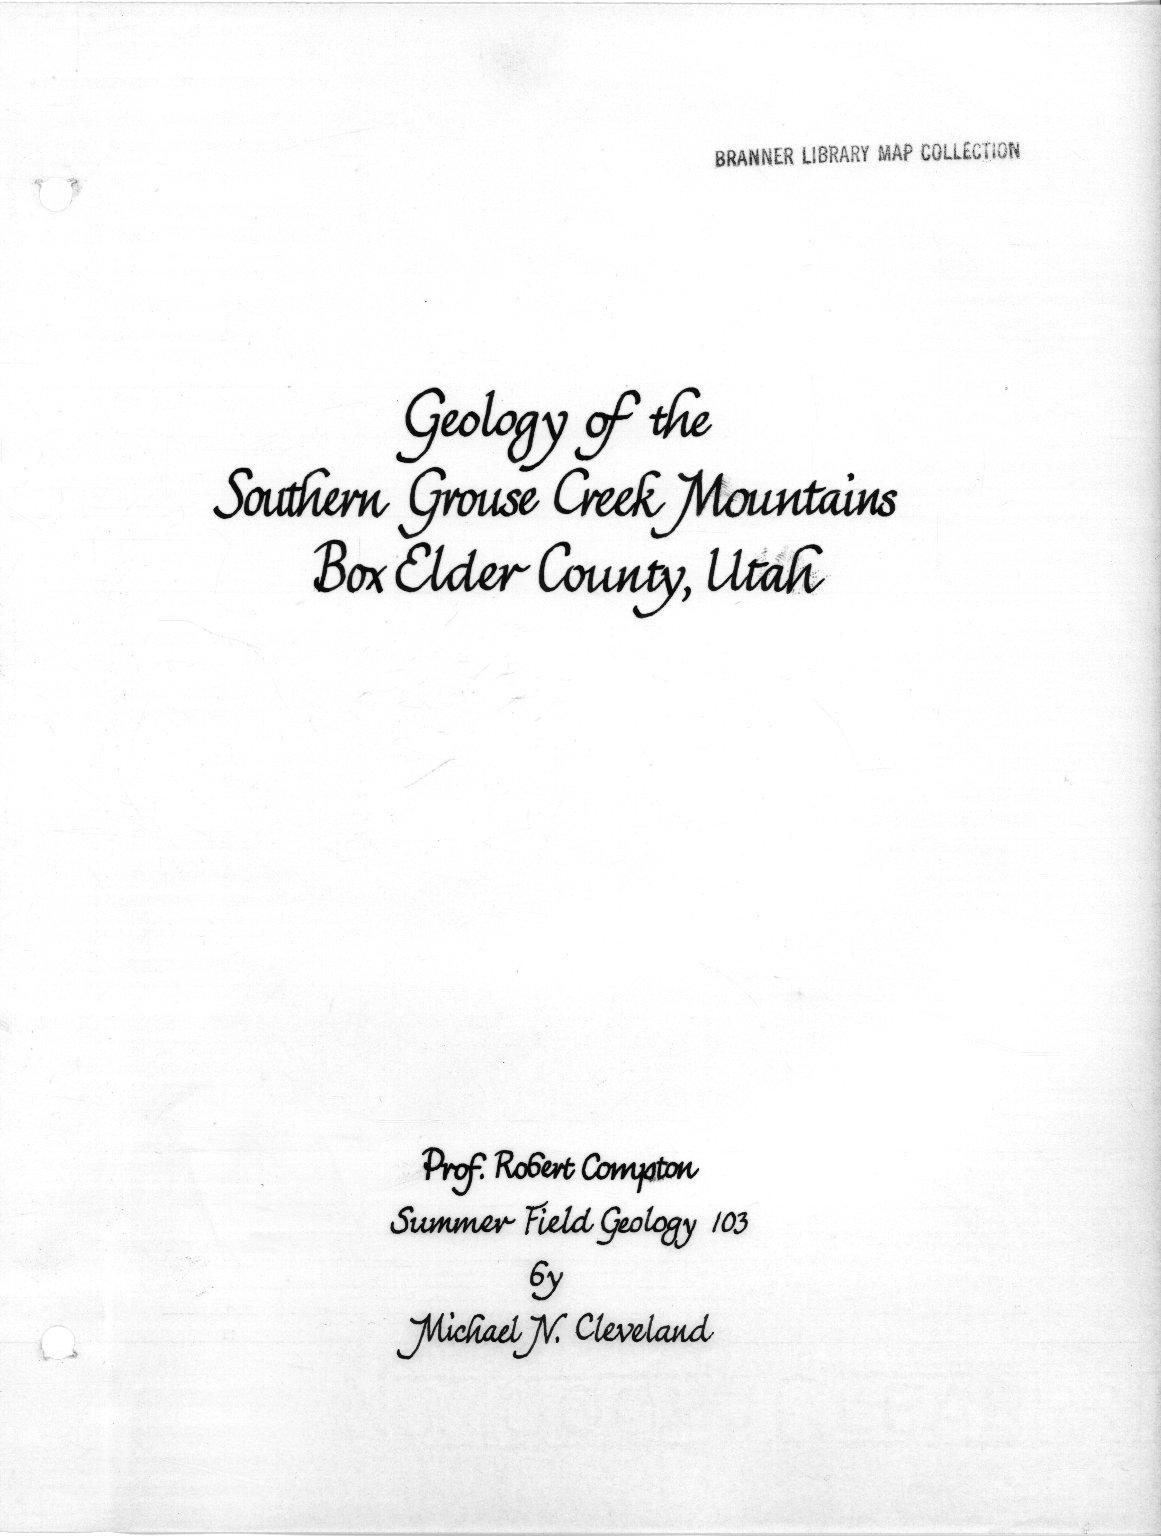 Geology of southern Grouse Creek mountains, Box Elder county, Utah